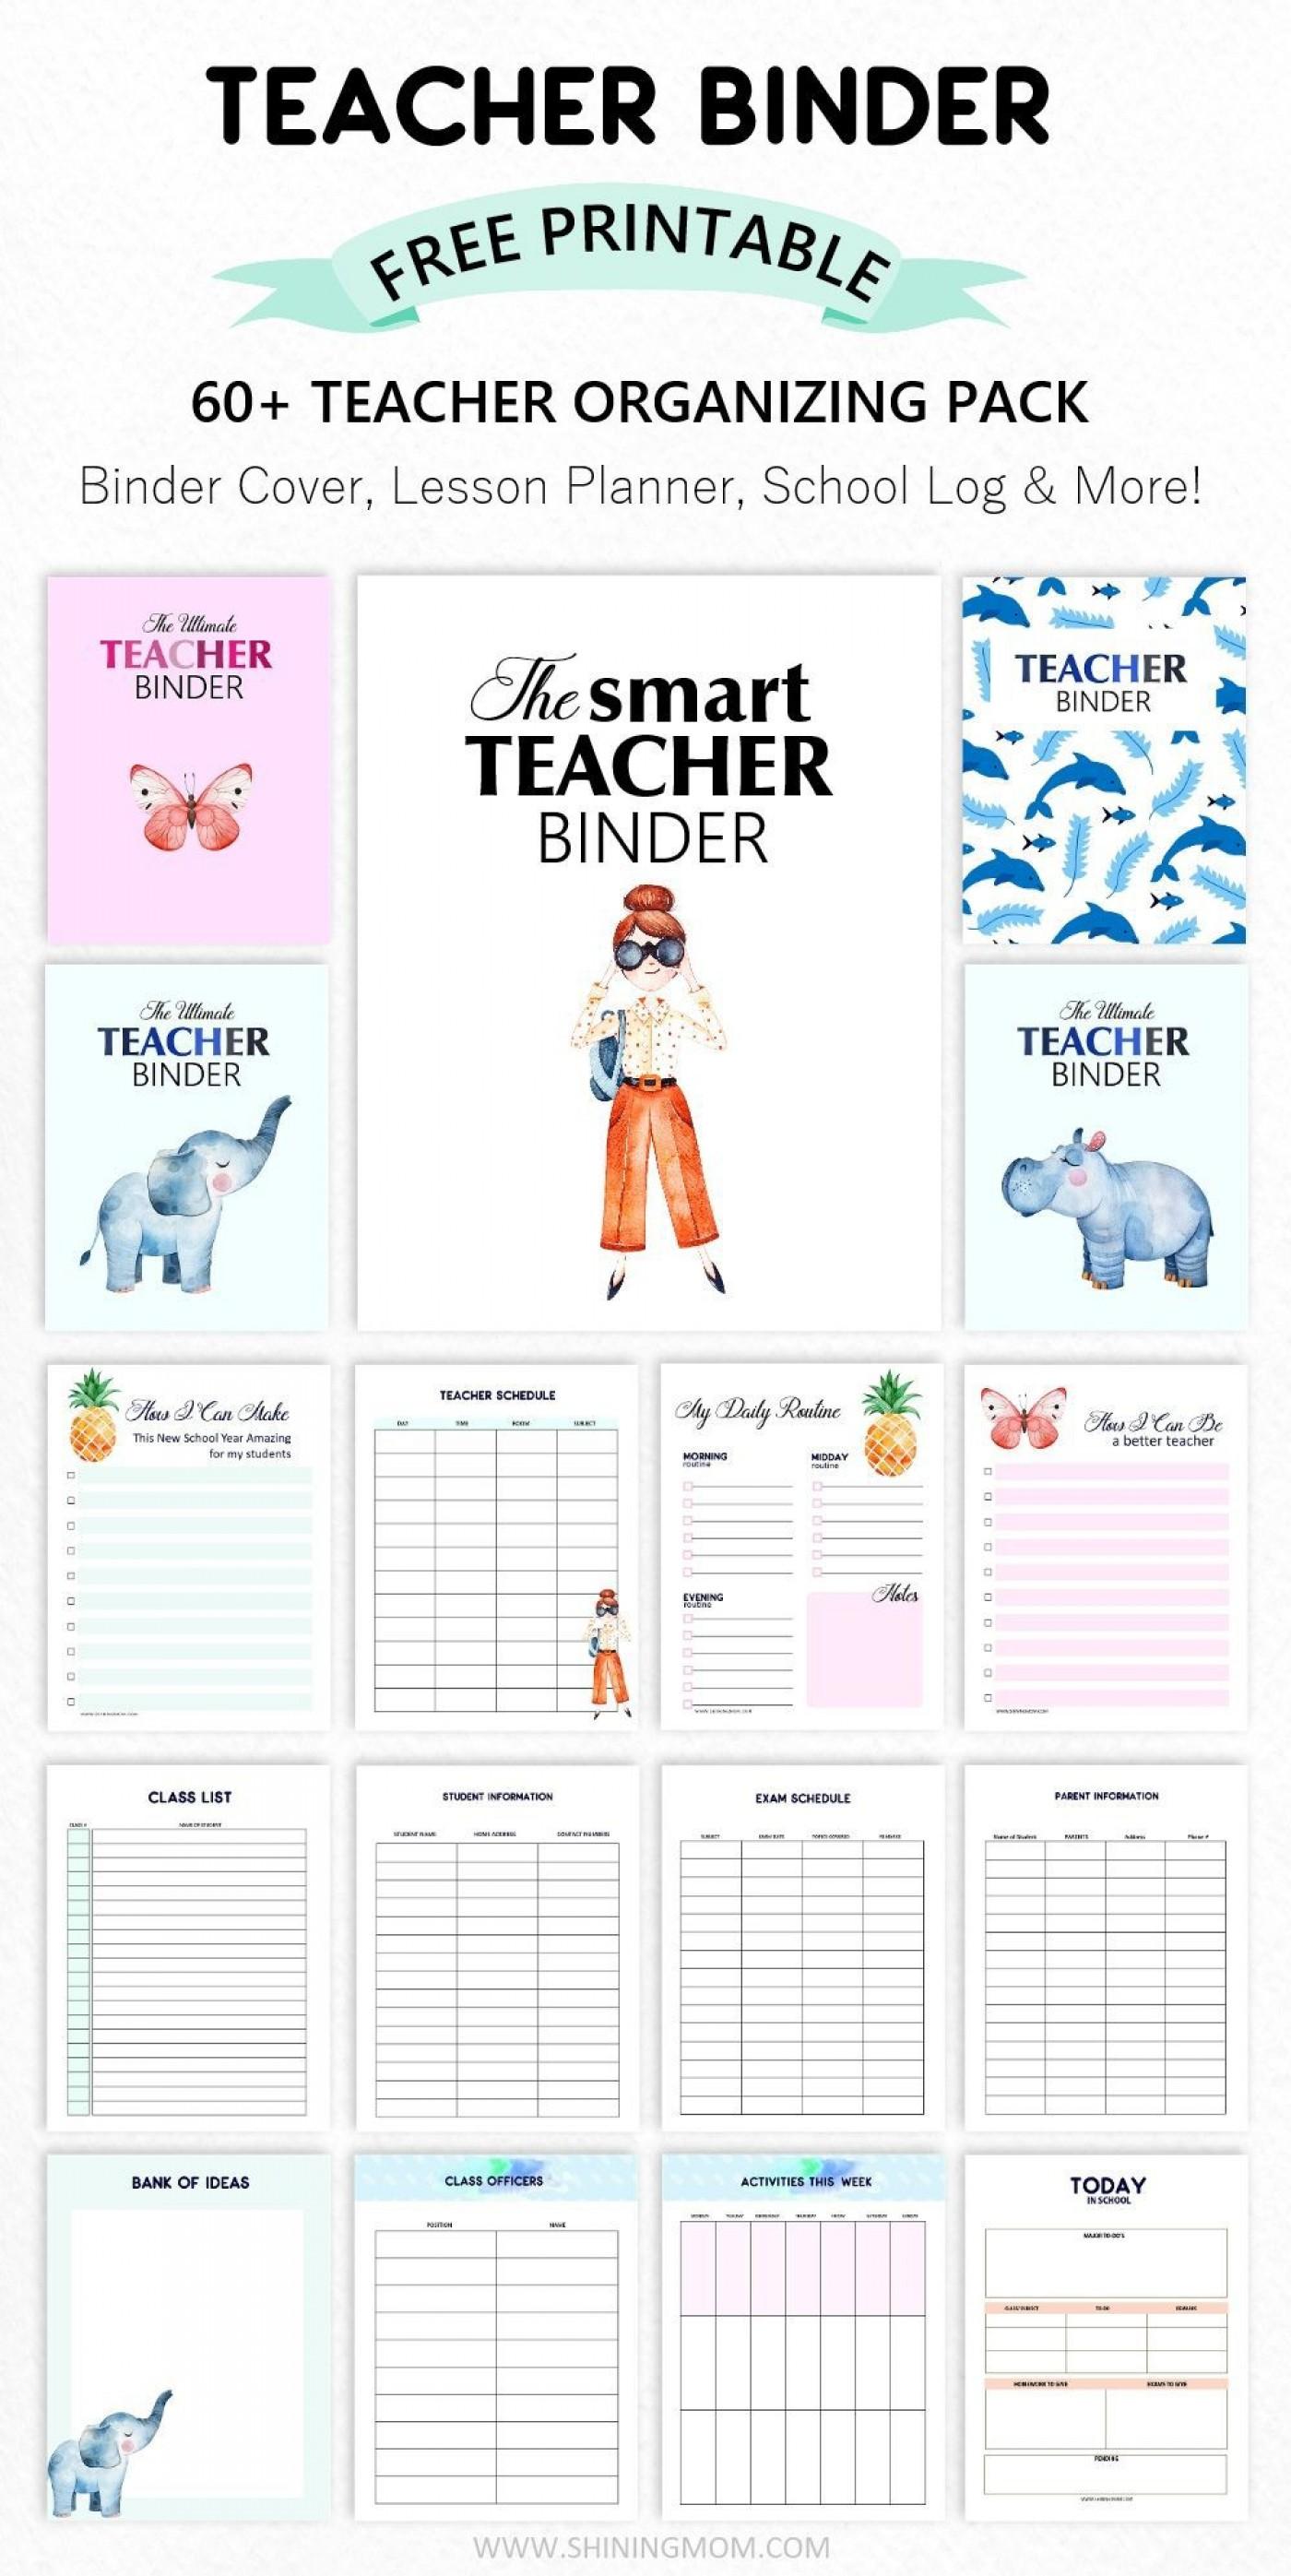 003 Formidable Free Printable Teacher Binder Template High Resolution 1400